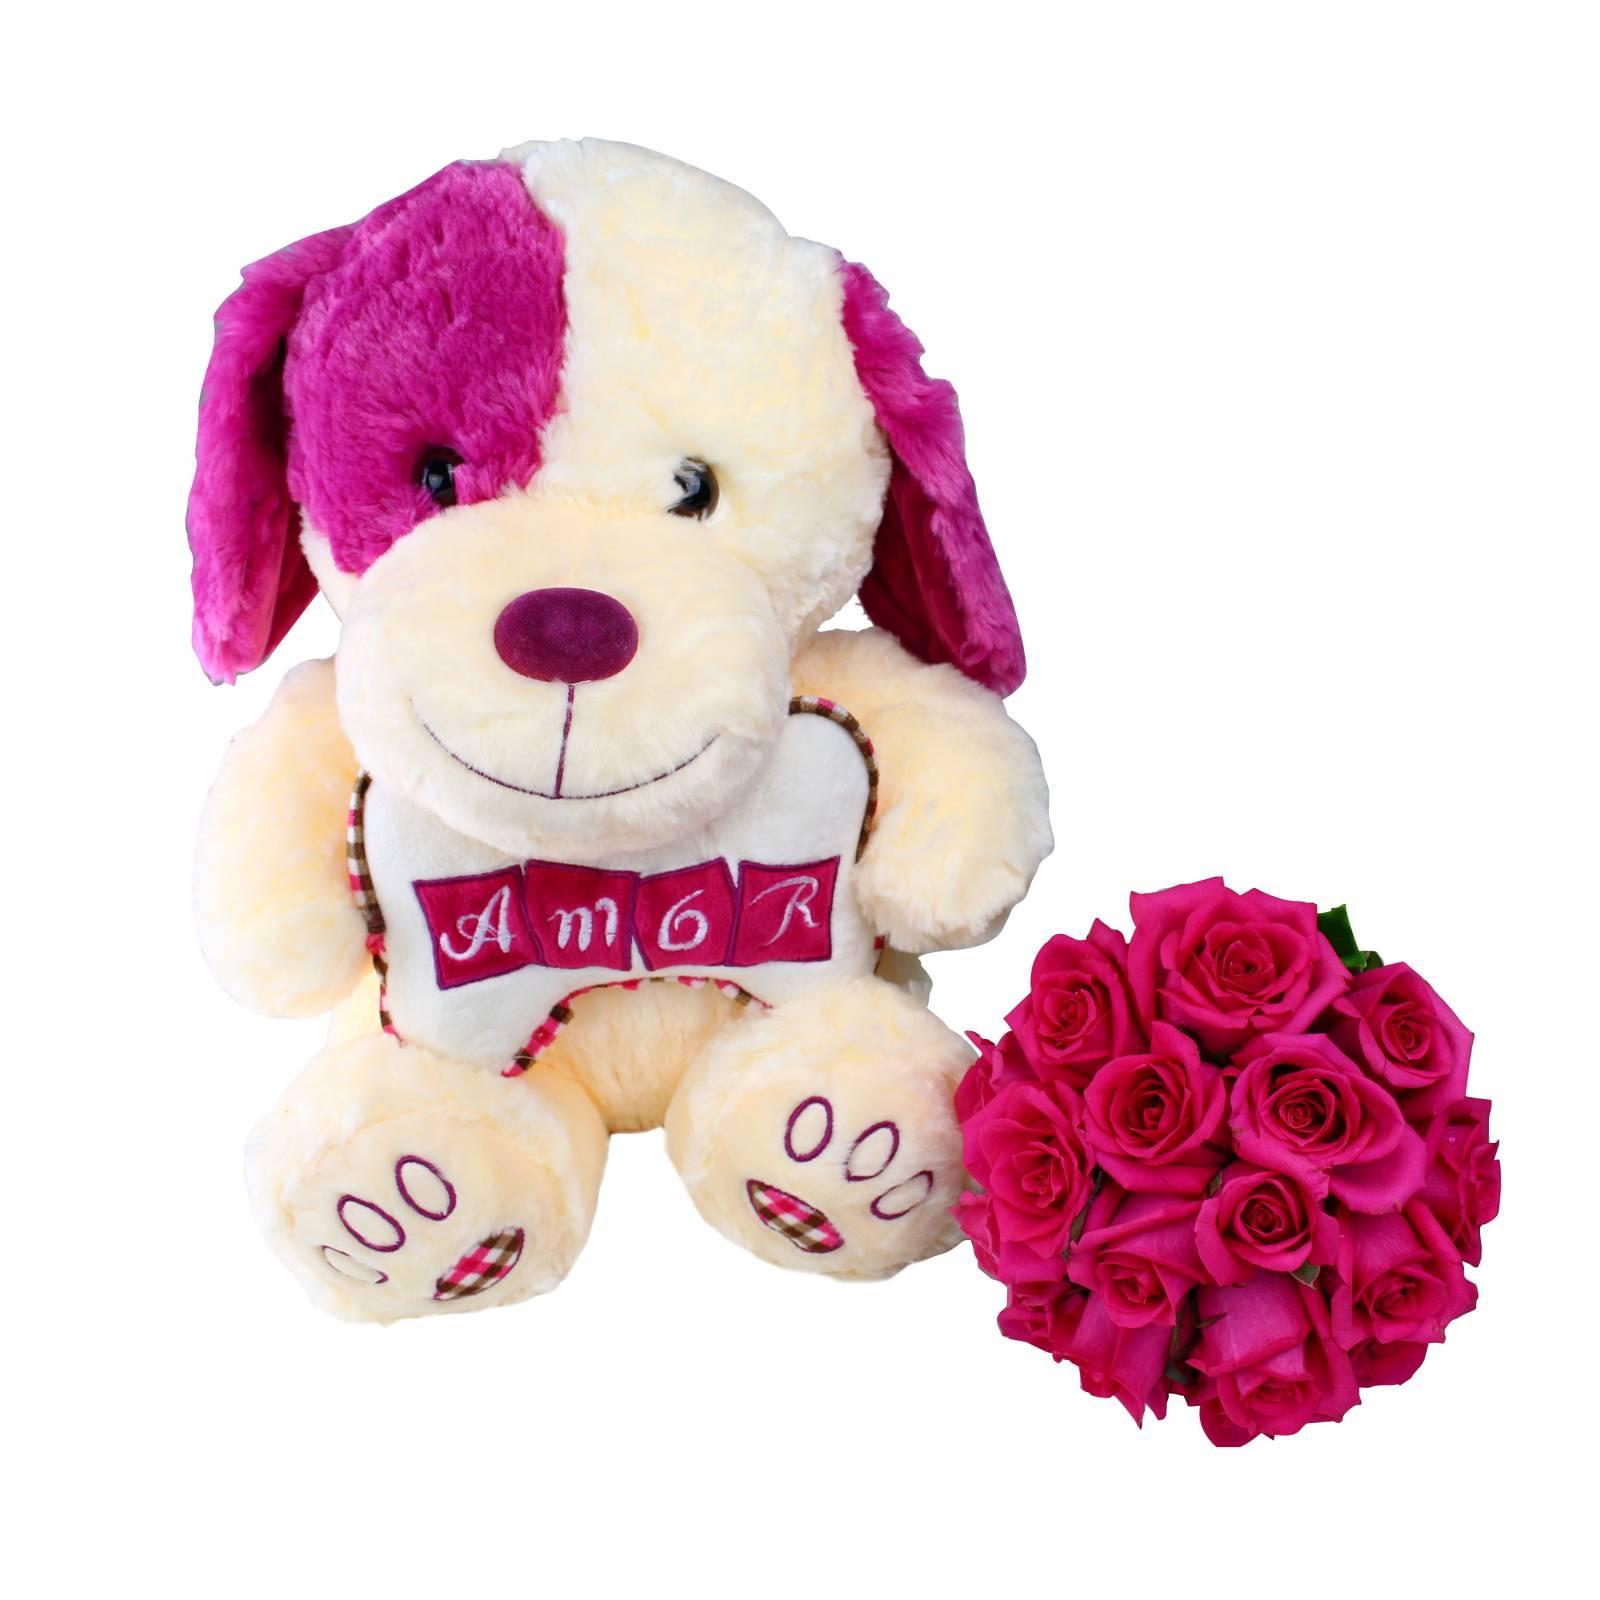 Amor Pink - Florisbella - Matriz Campinas